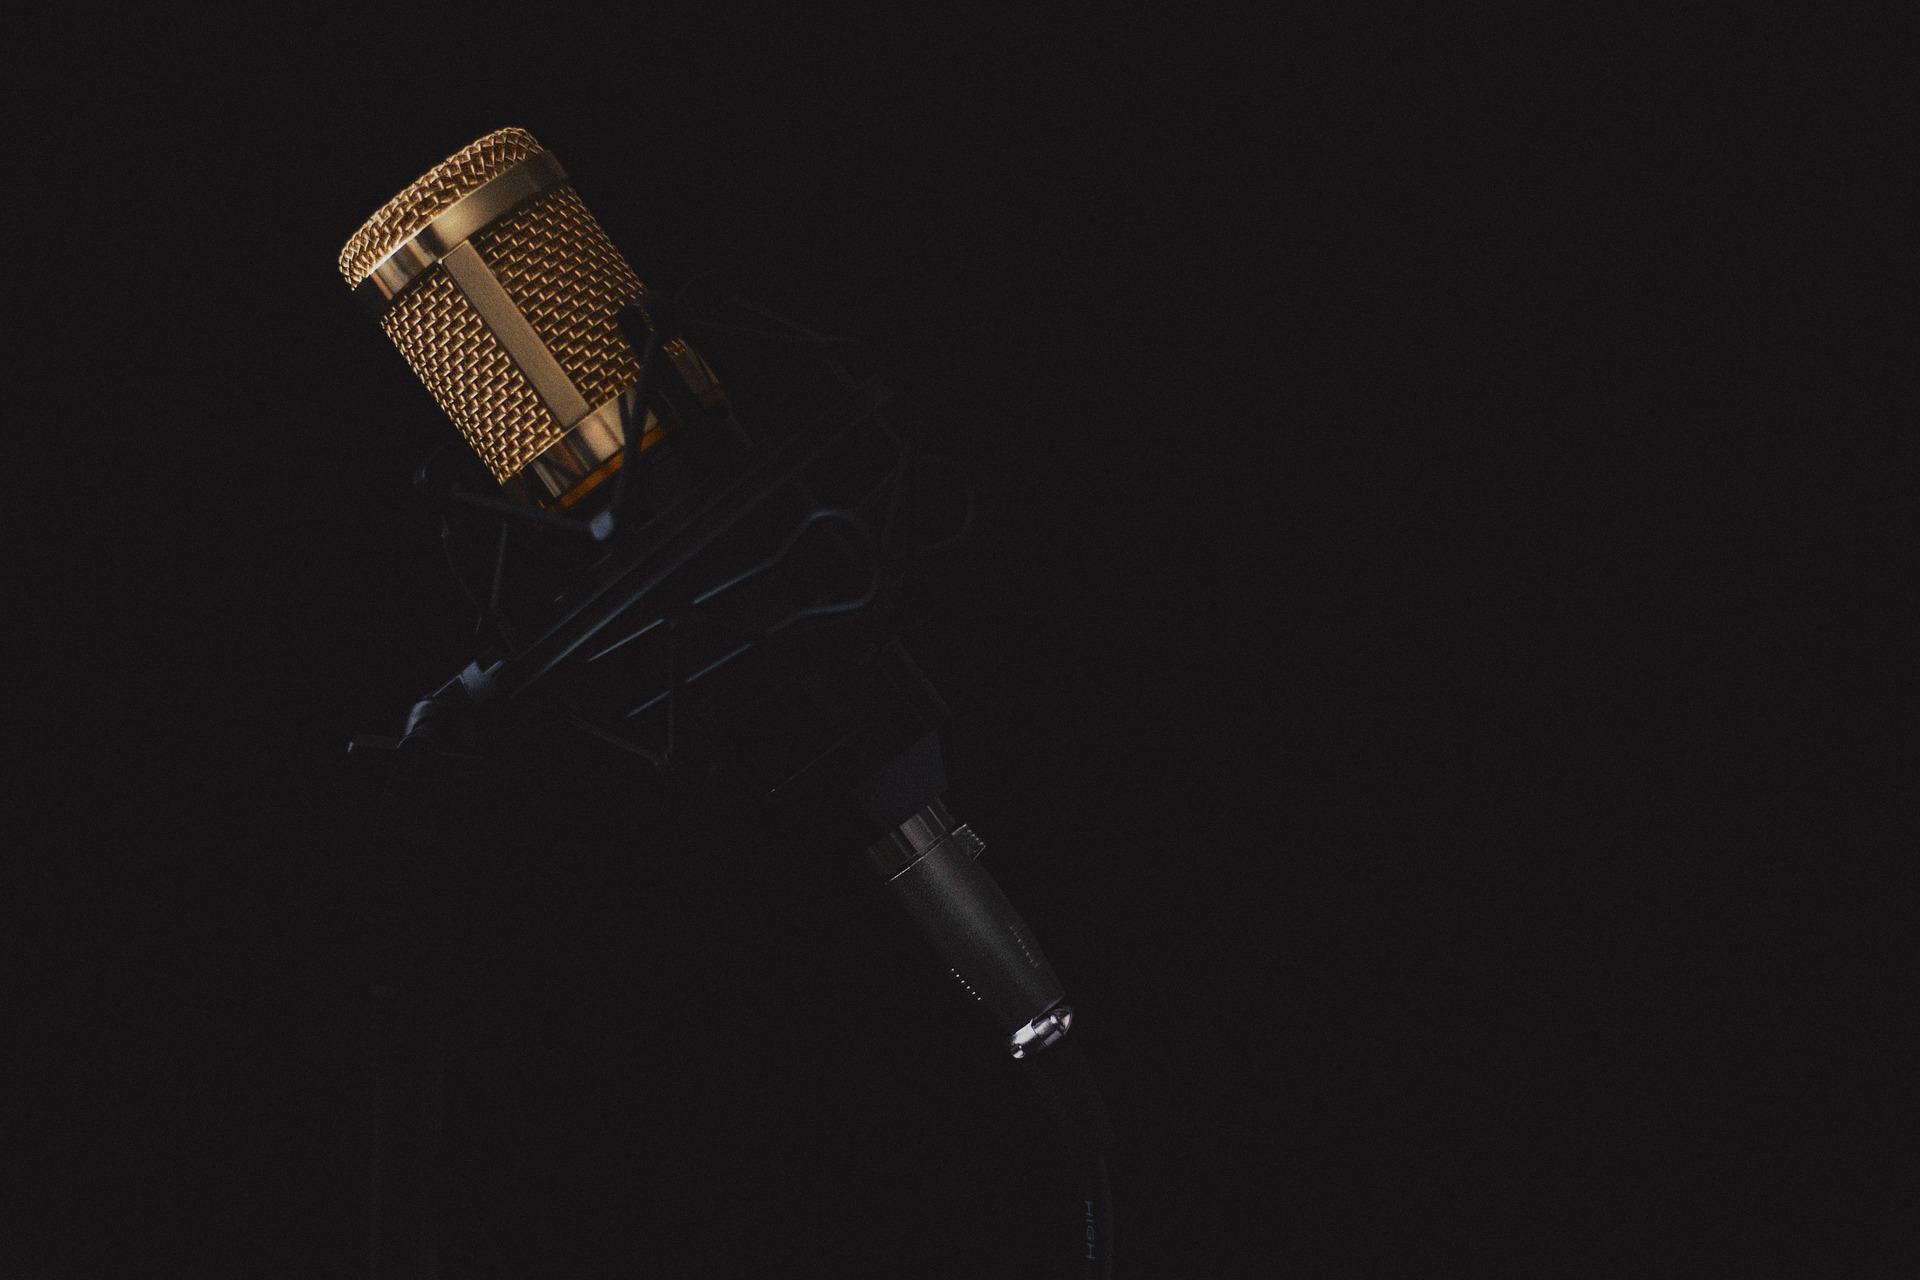 Citizens' Secret Recording and the First Amendment